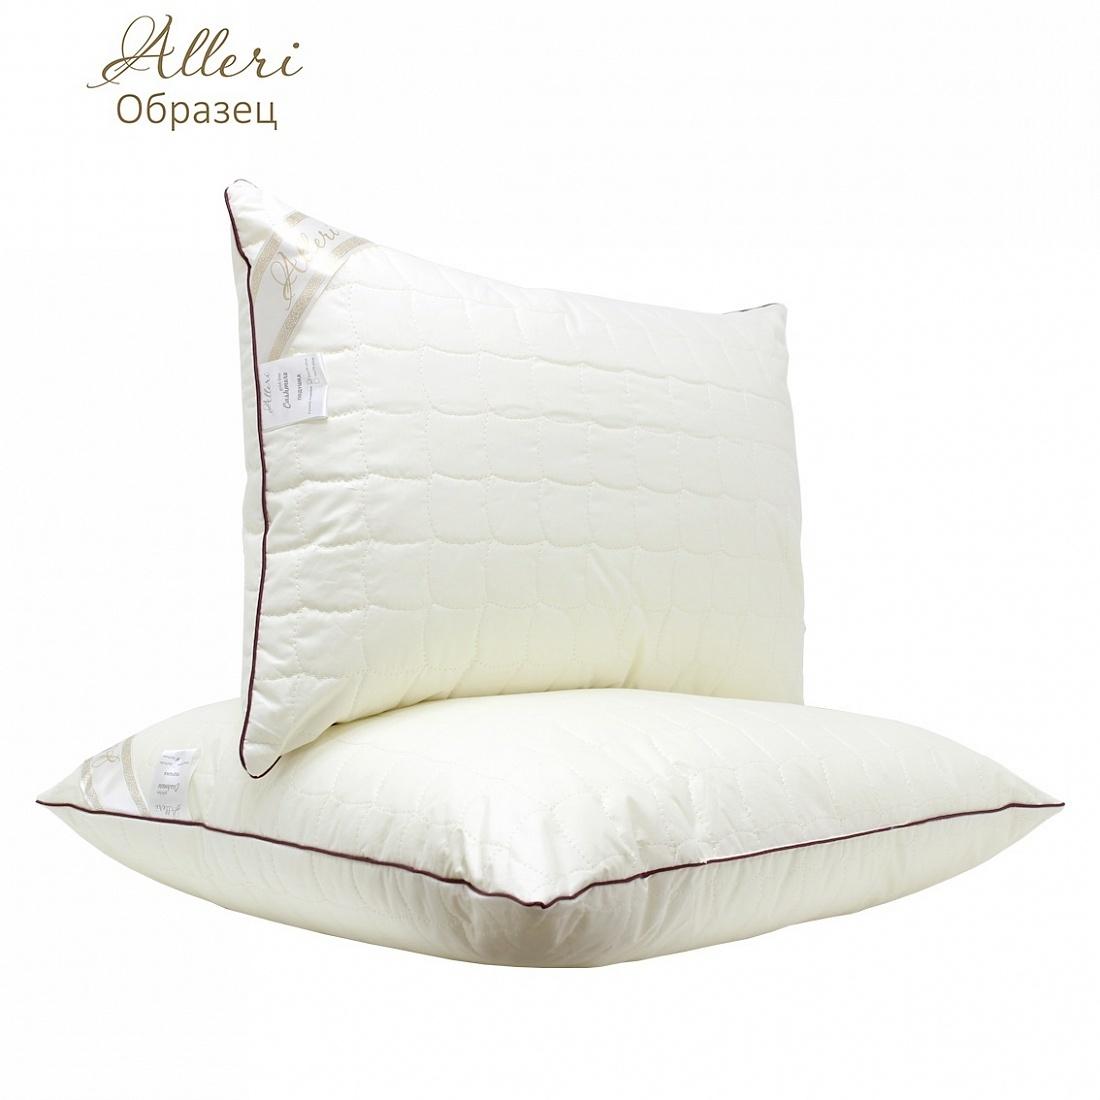 Подушка Eco-line platinum (Батист)